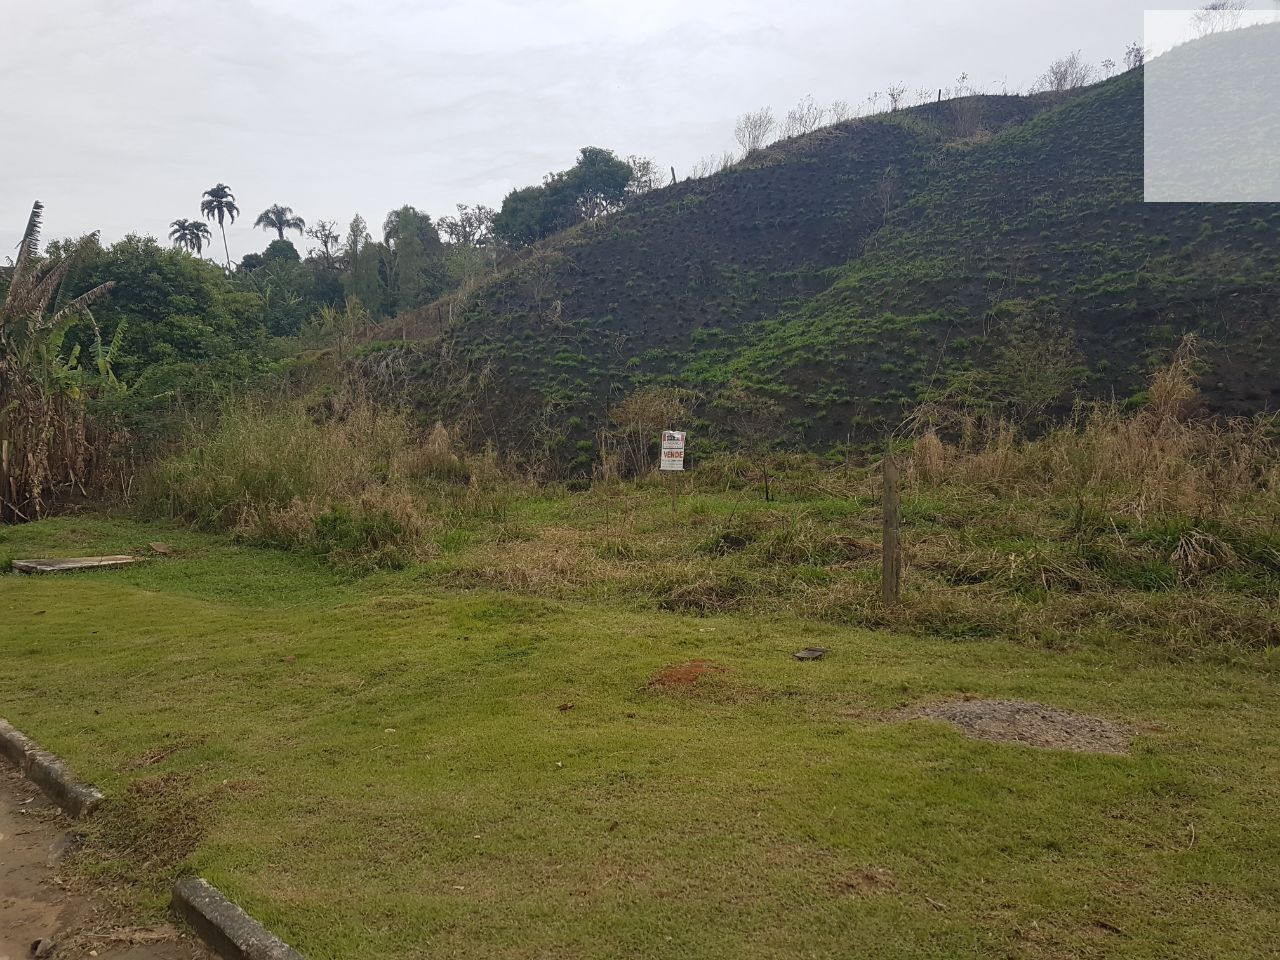 Terreno/Lote à venda  no Centro - Mendes, RJ. Imóveis